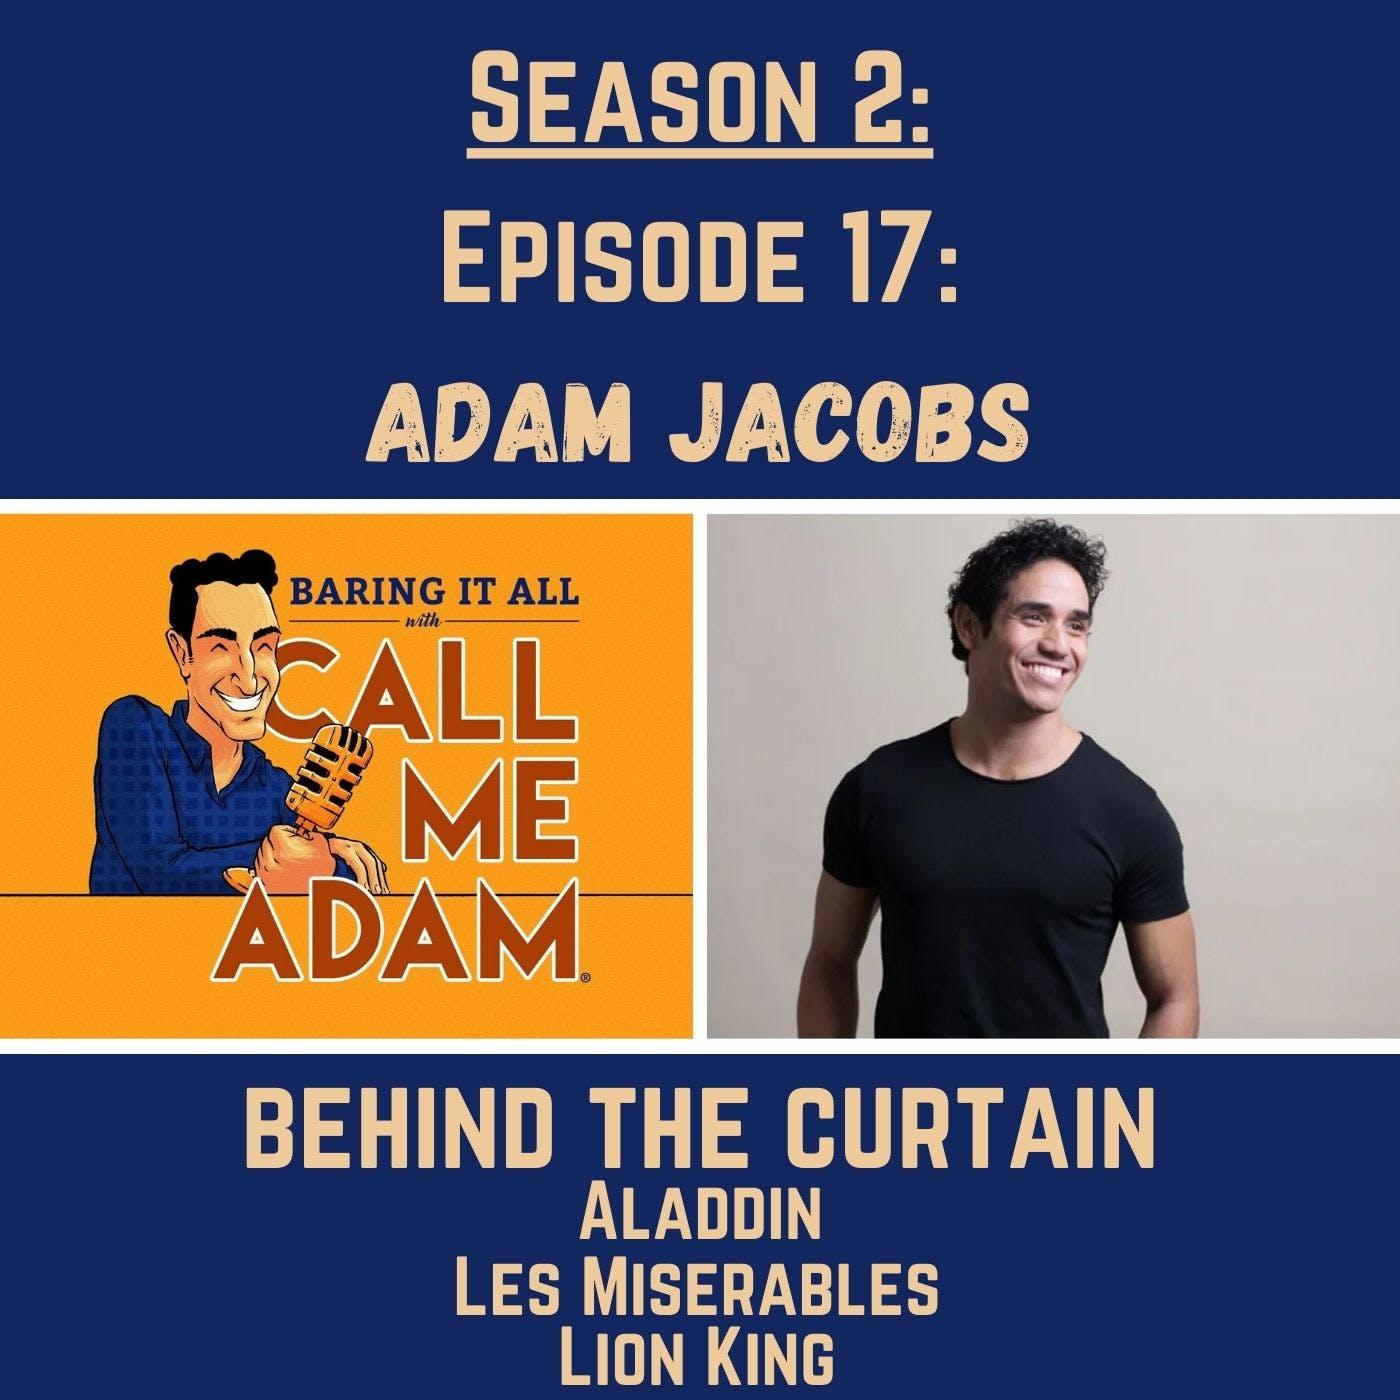 Season 2: Episode 17: Adam Jacobs: Behind the Curtain, Broadway, Aladdin, Lion King, Les Miserables, Mamma Mia!, Stage Mishaps, Showmances, Marriage, Fatherhood, Actor